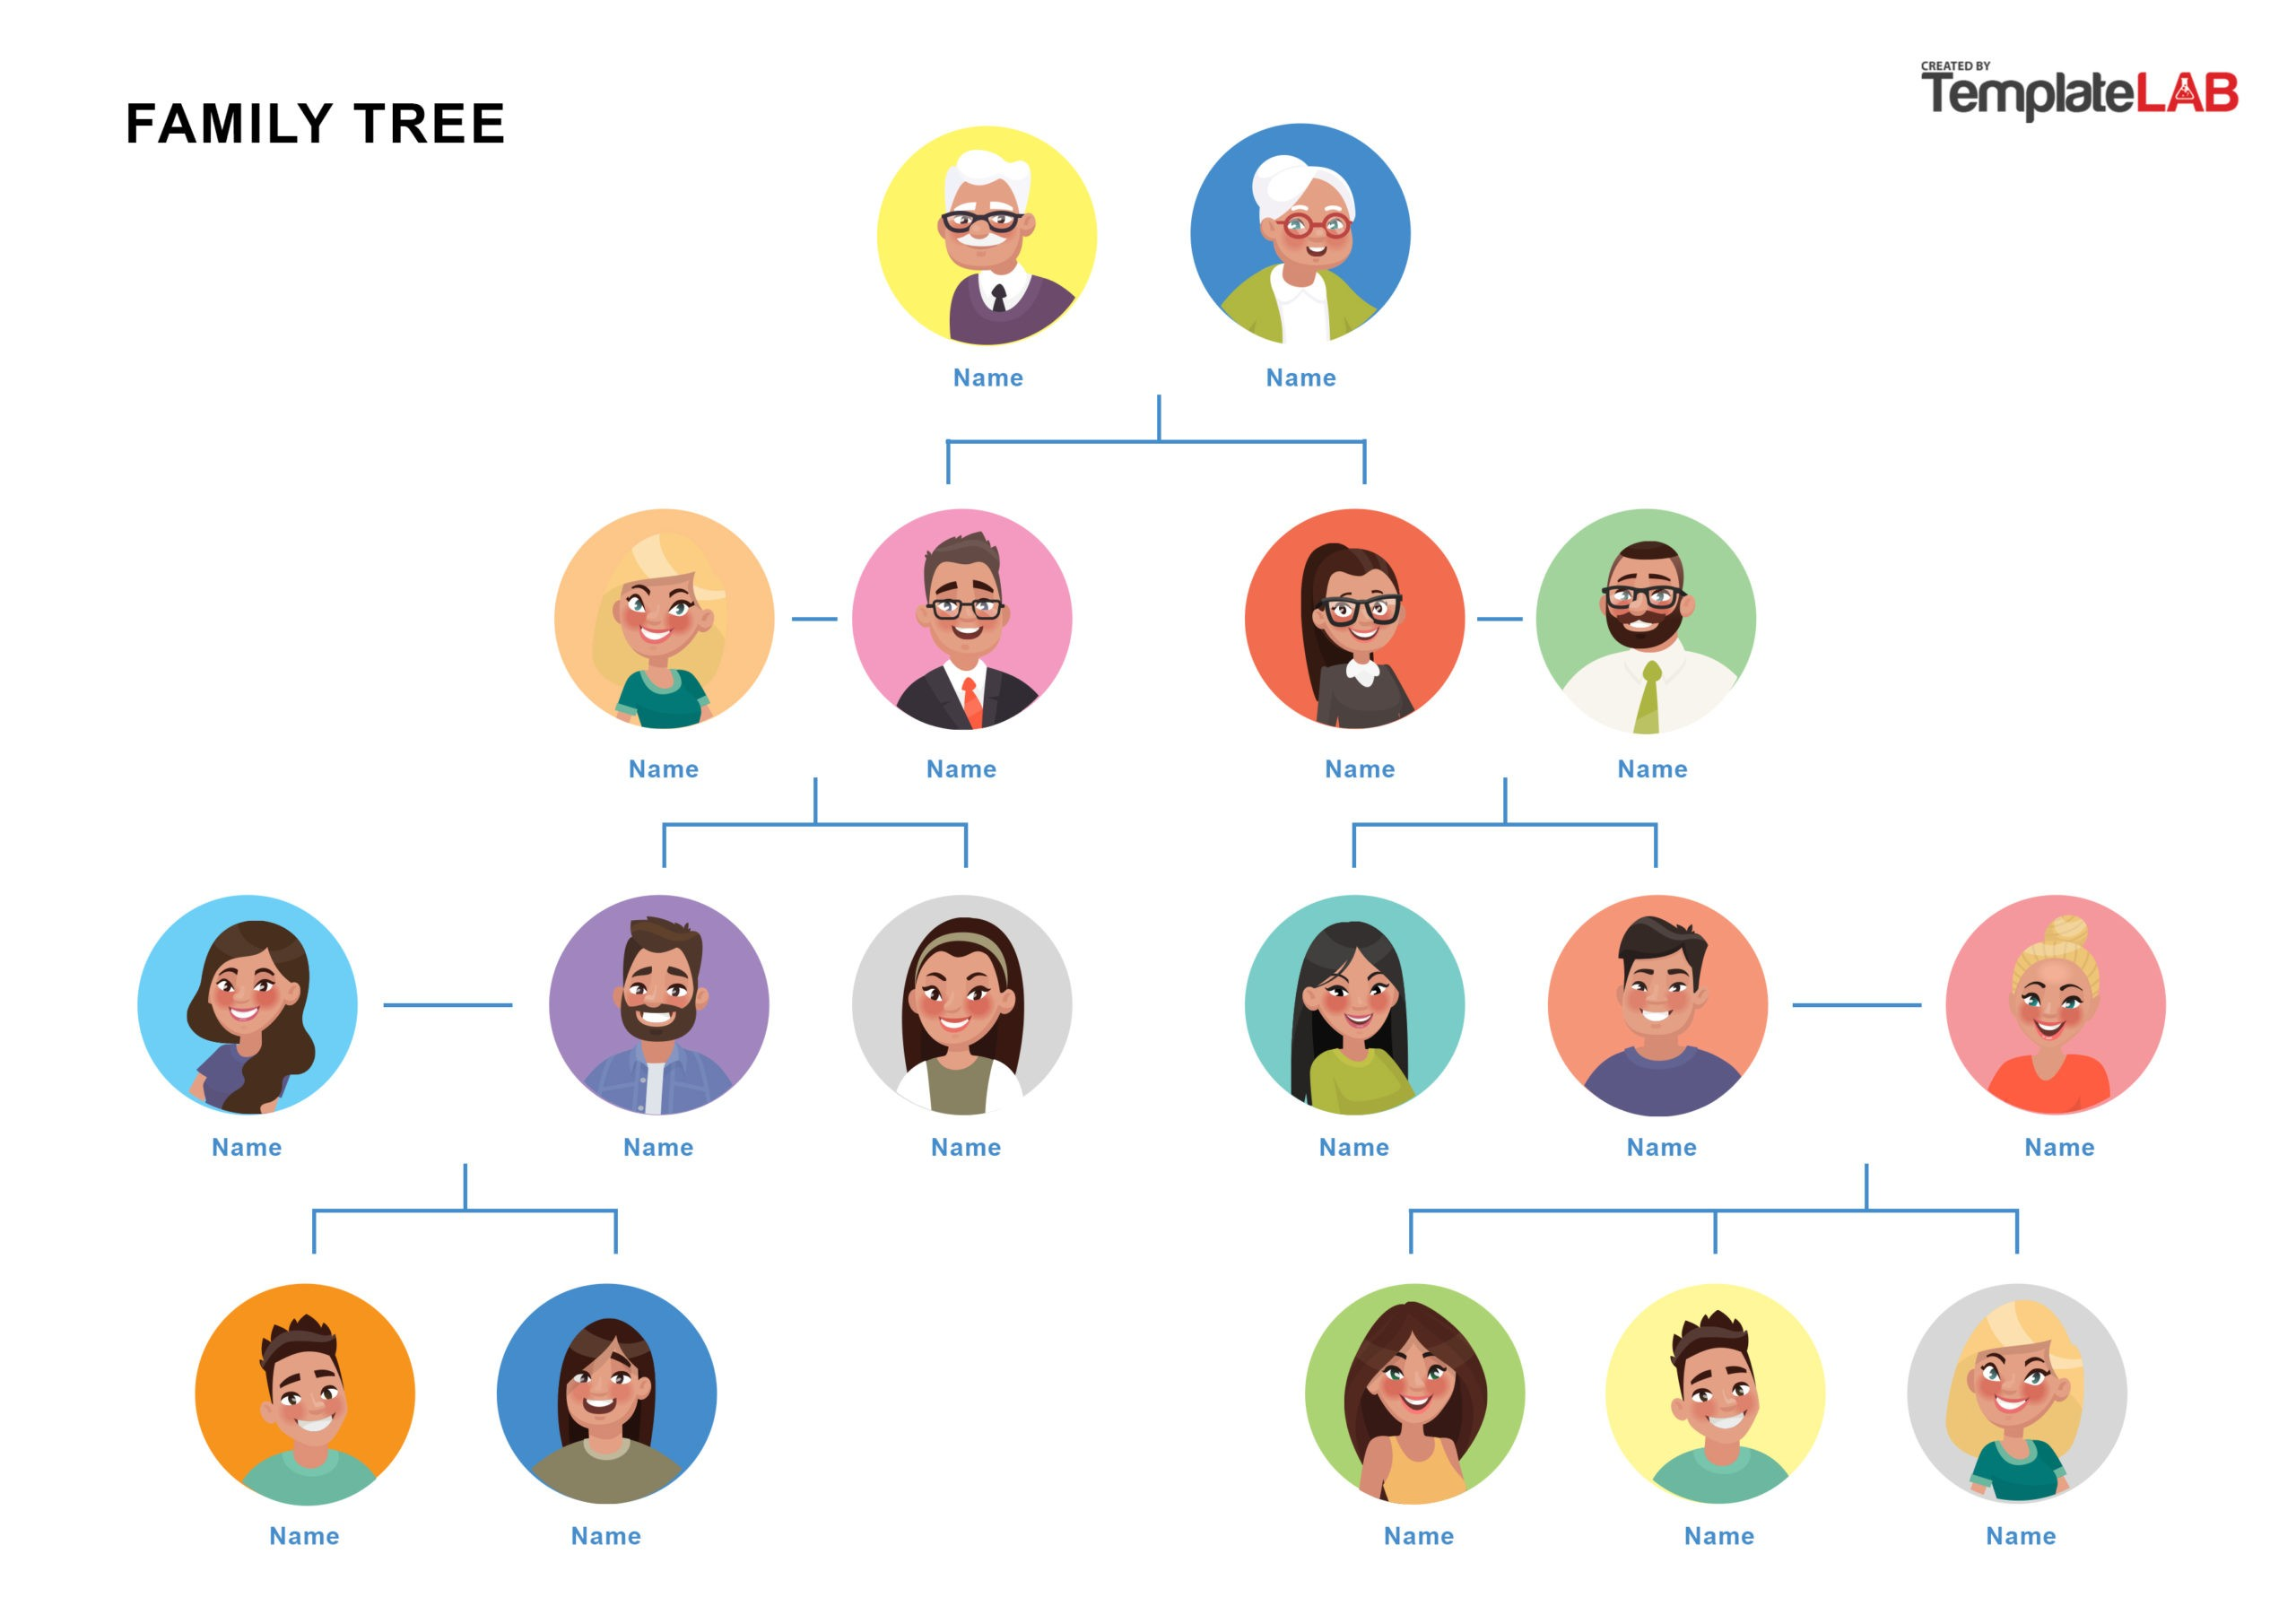 Free Family Tree Template 18 - TemplateLab.com